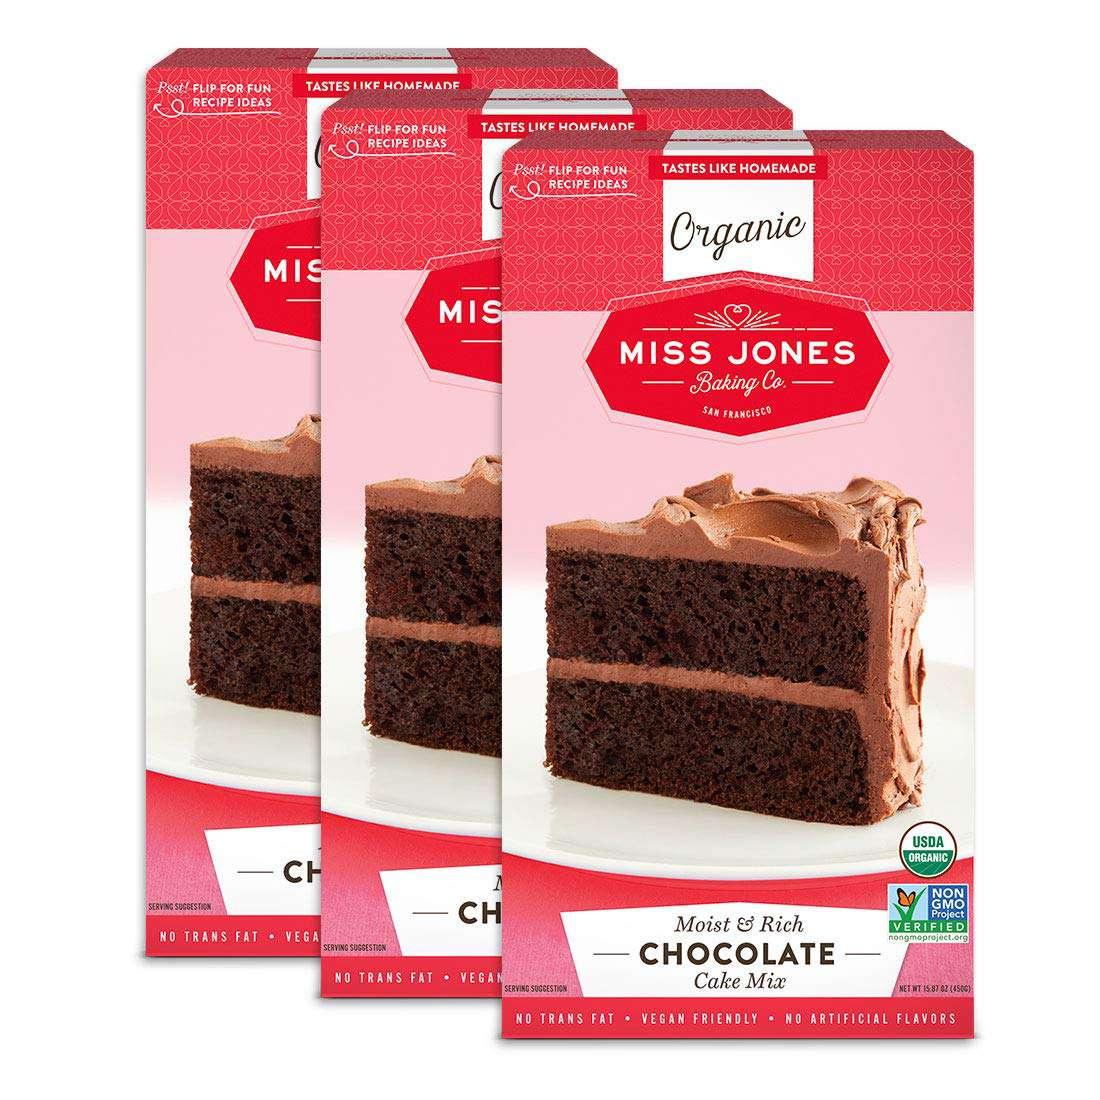 Miss Jones Baking Organic Chocolate Cake and Cupcake Mix